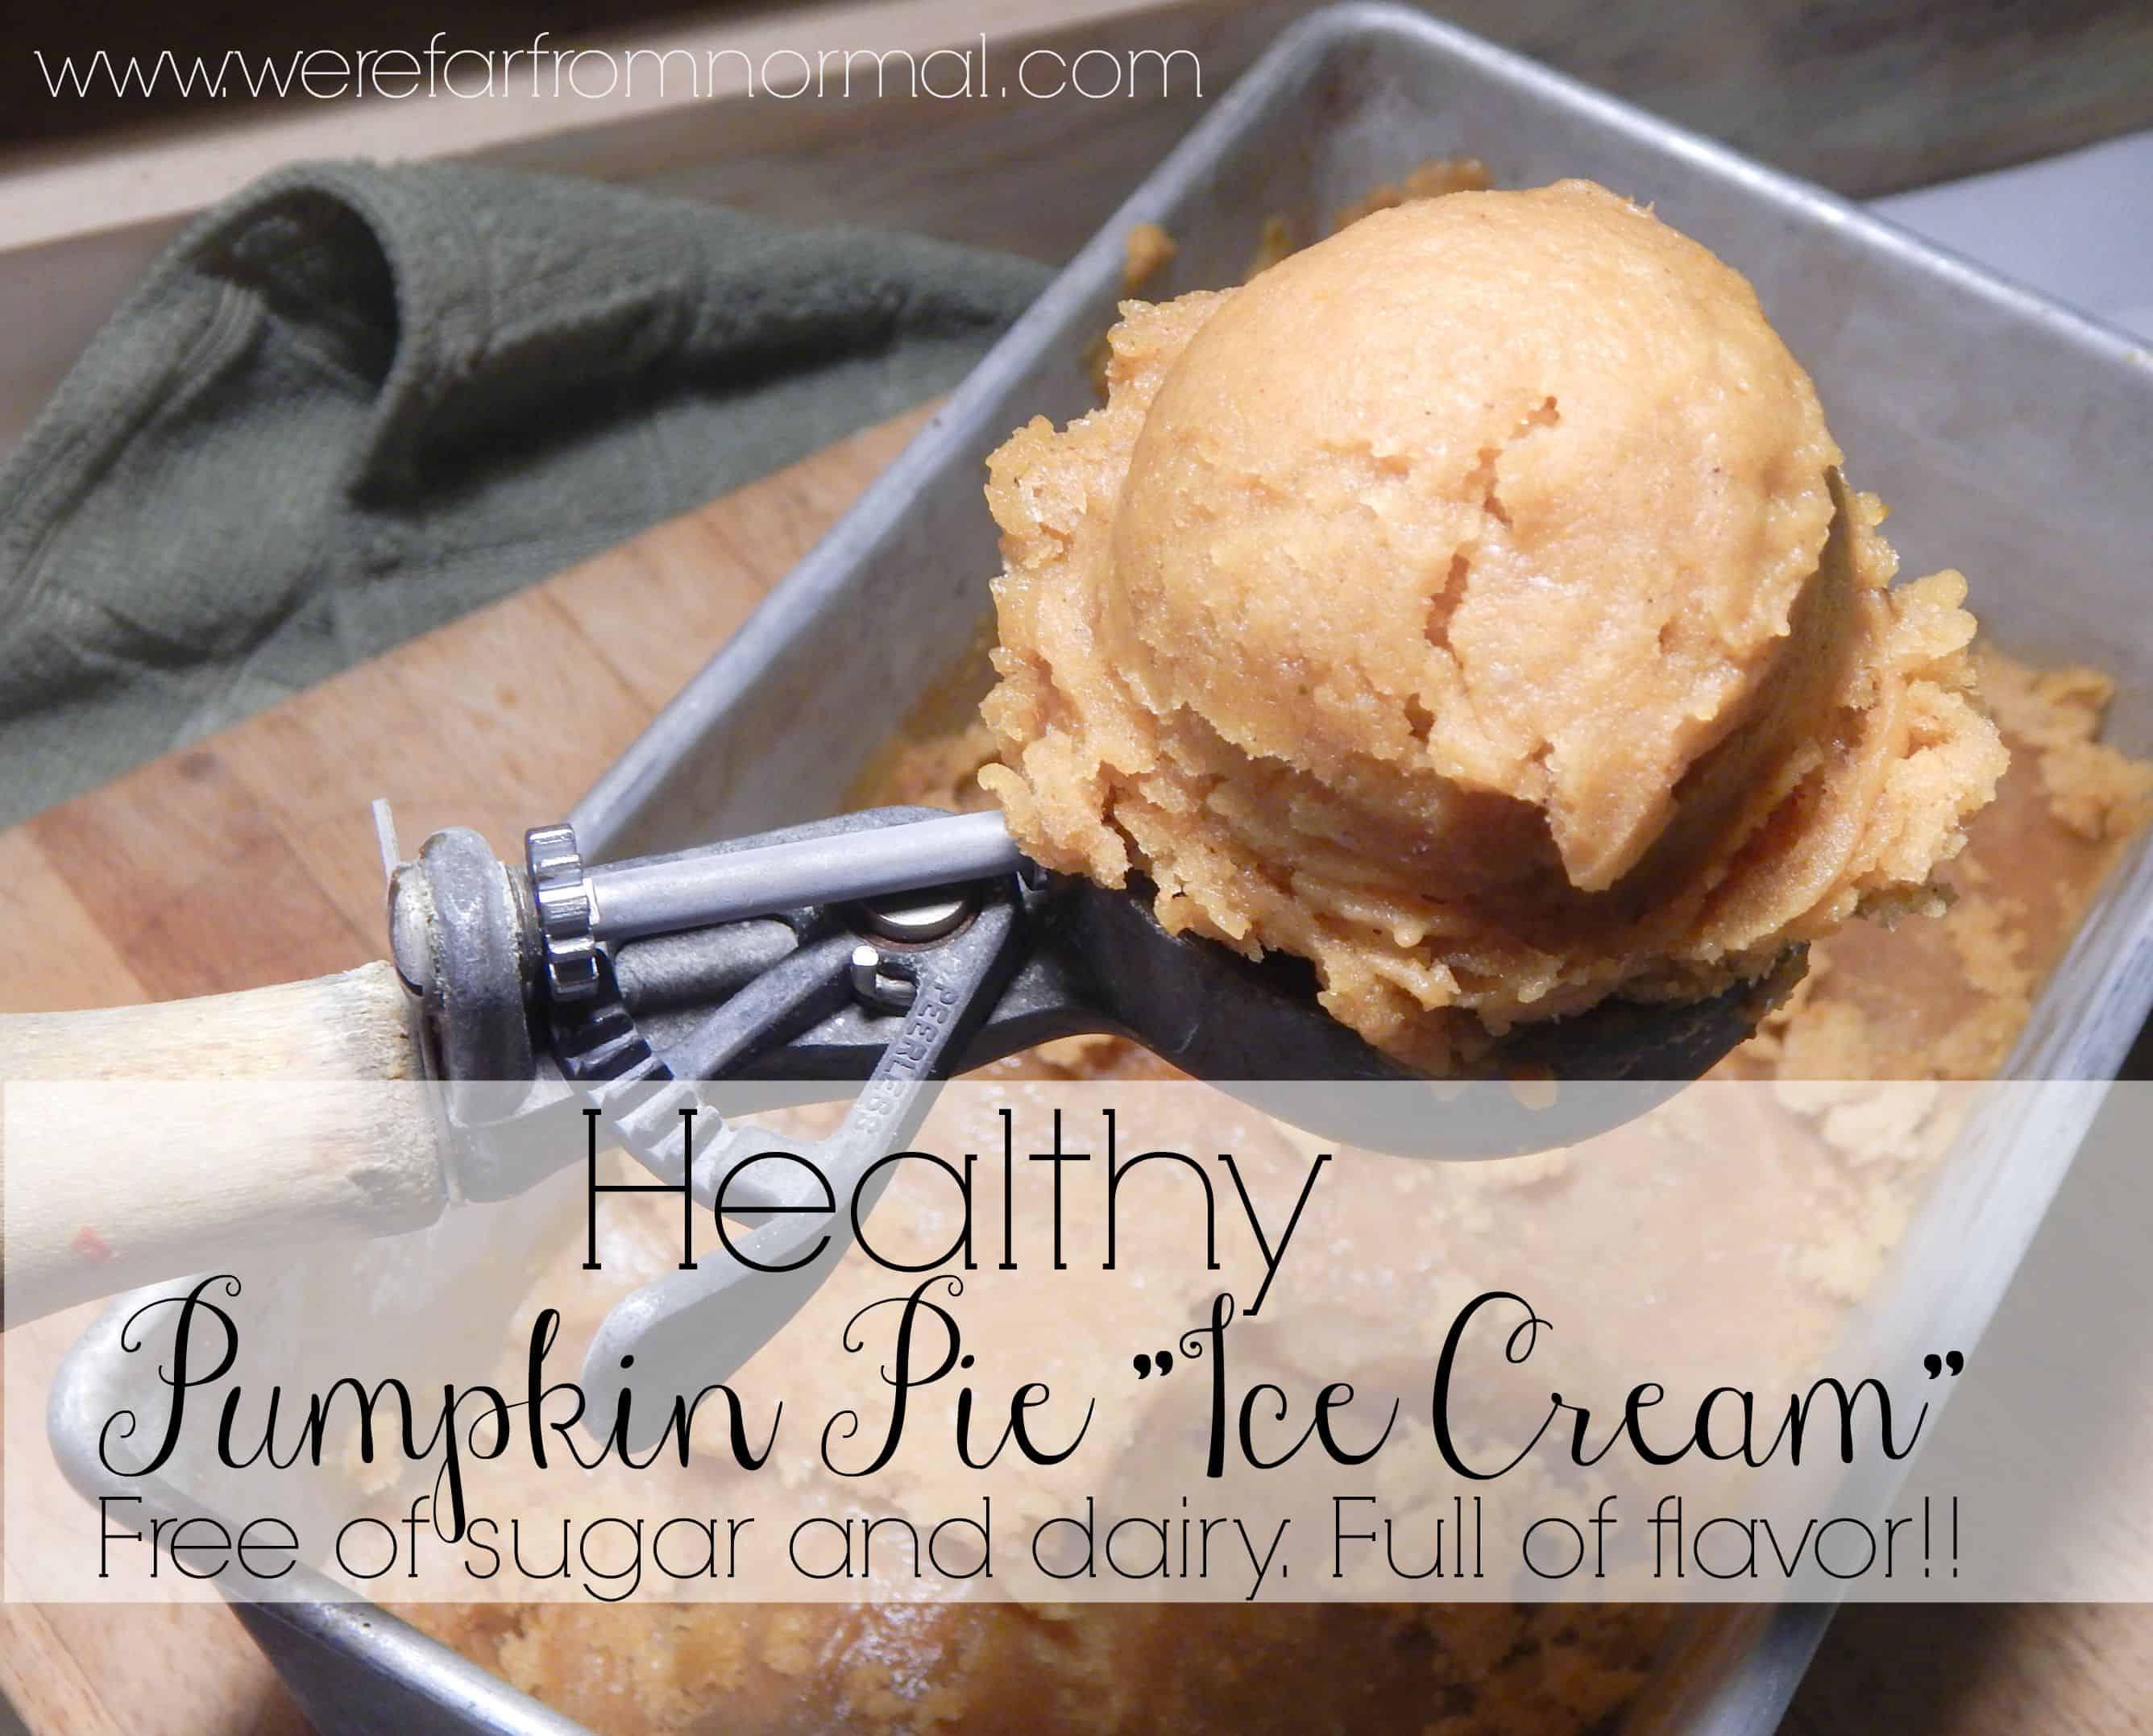 Healthy Pumpkin Ice Cream